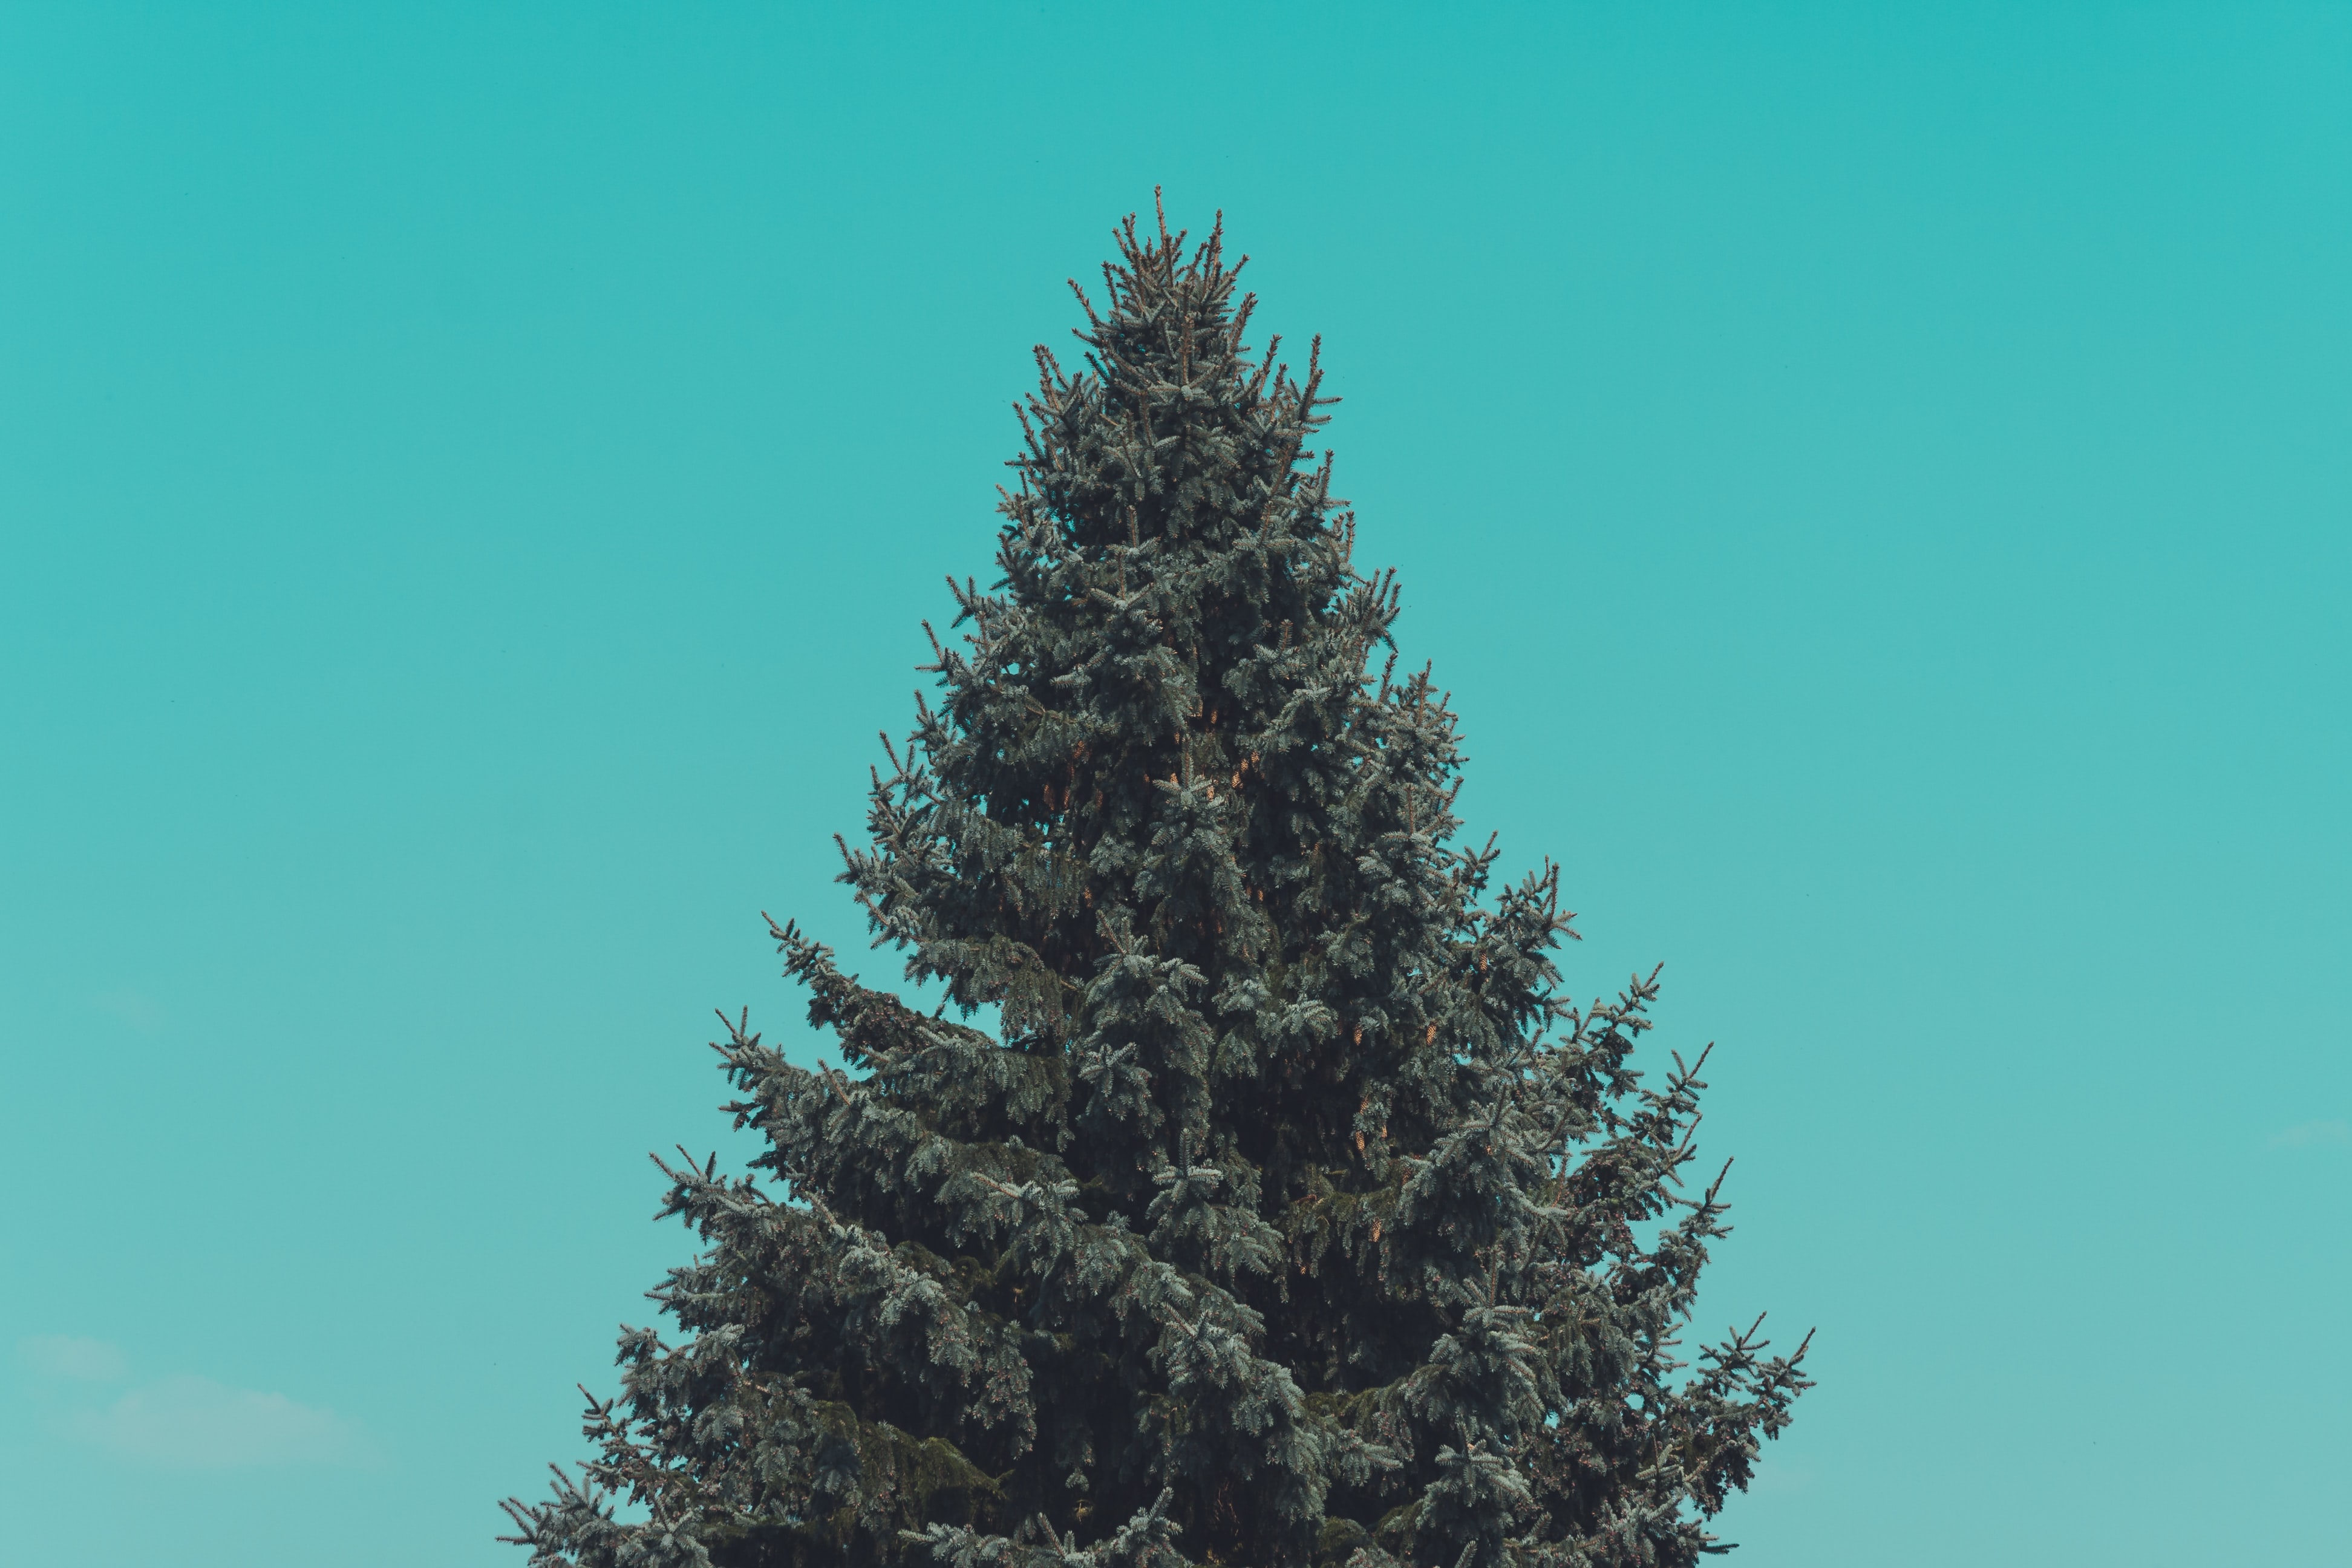 green pine tree under green sky